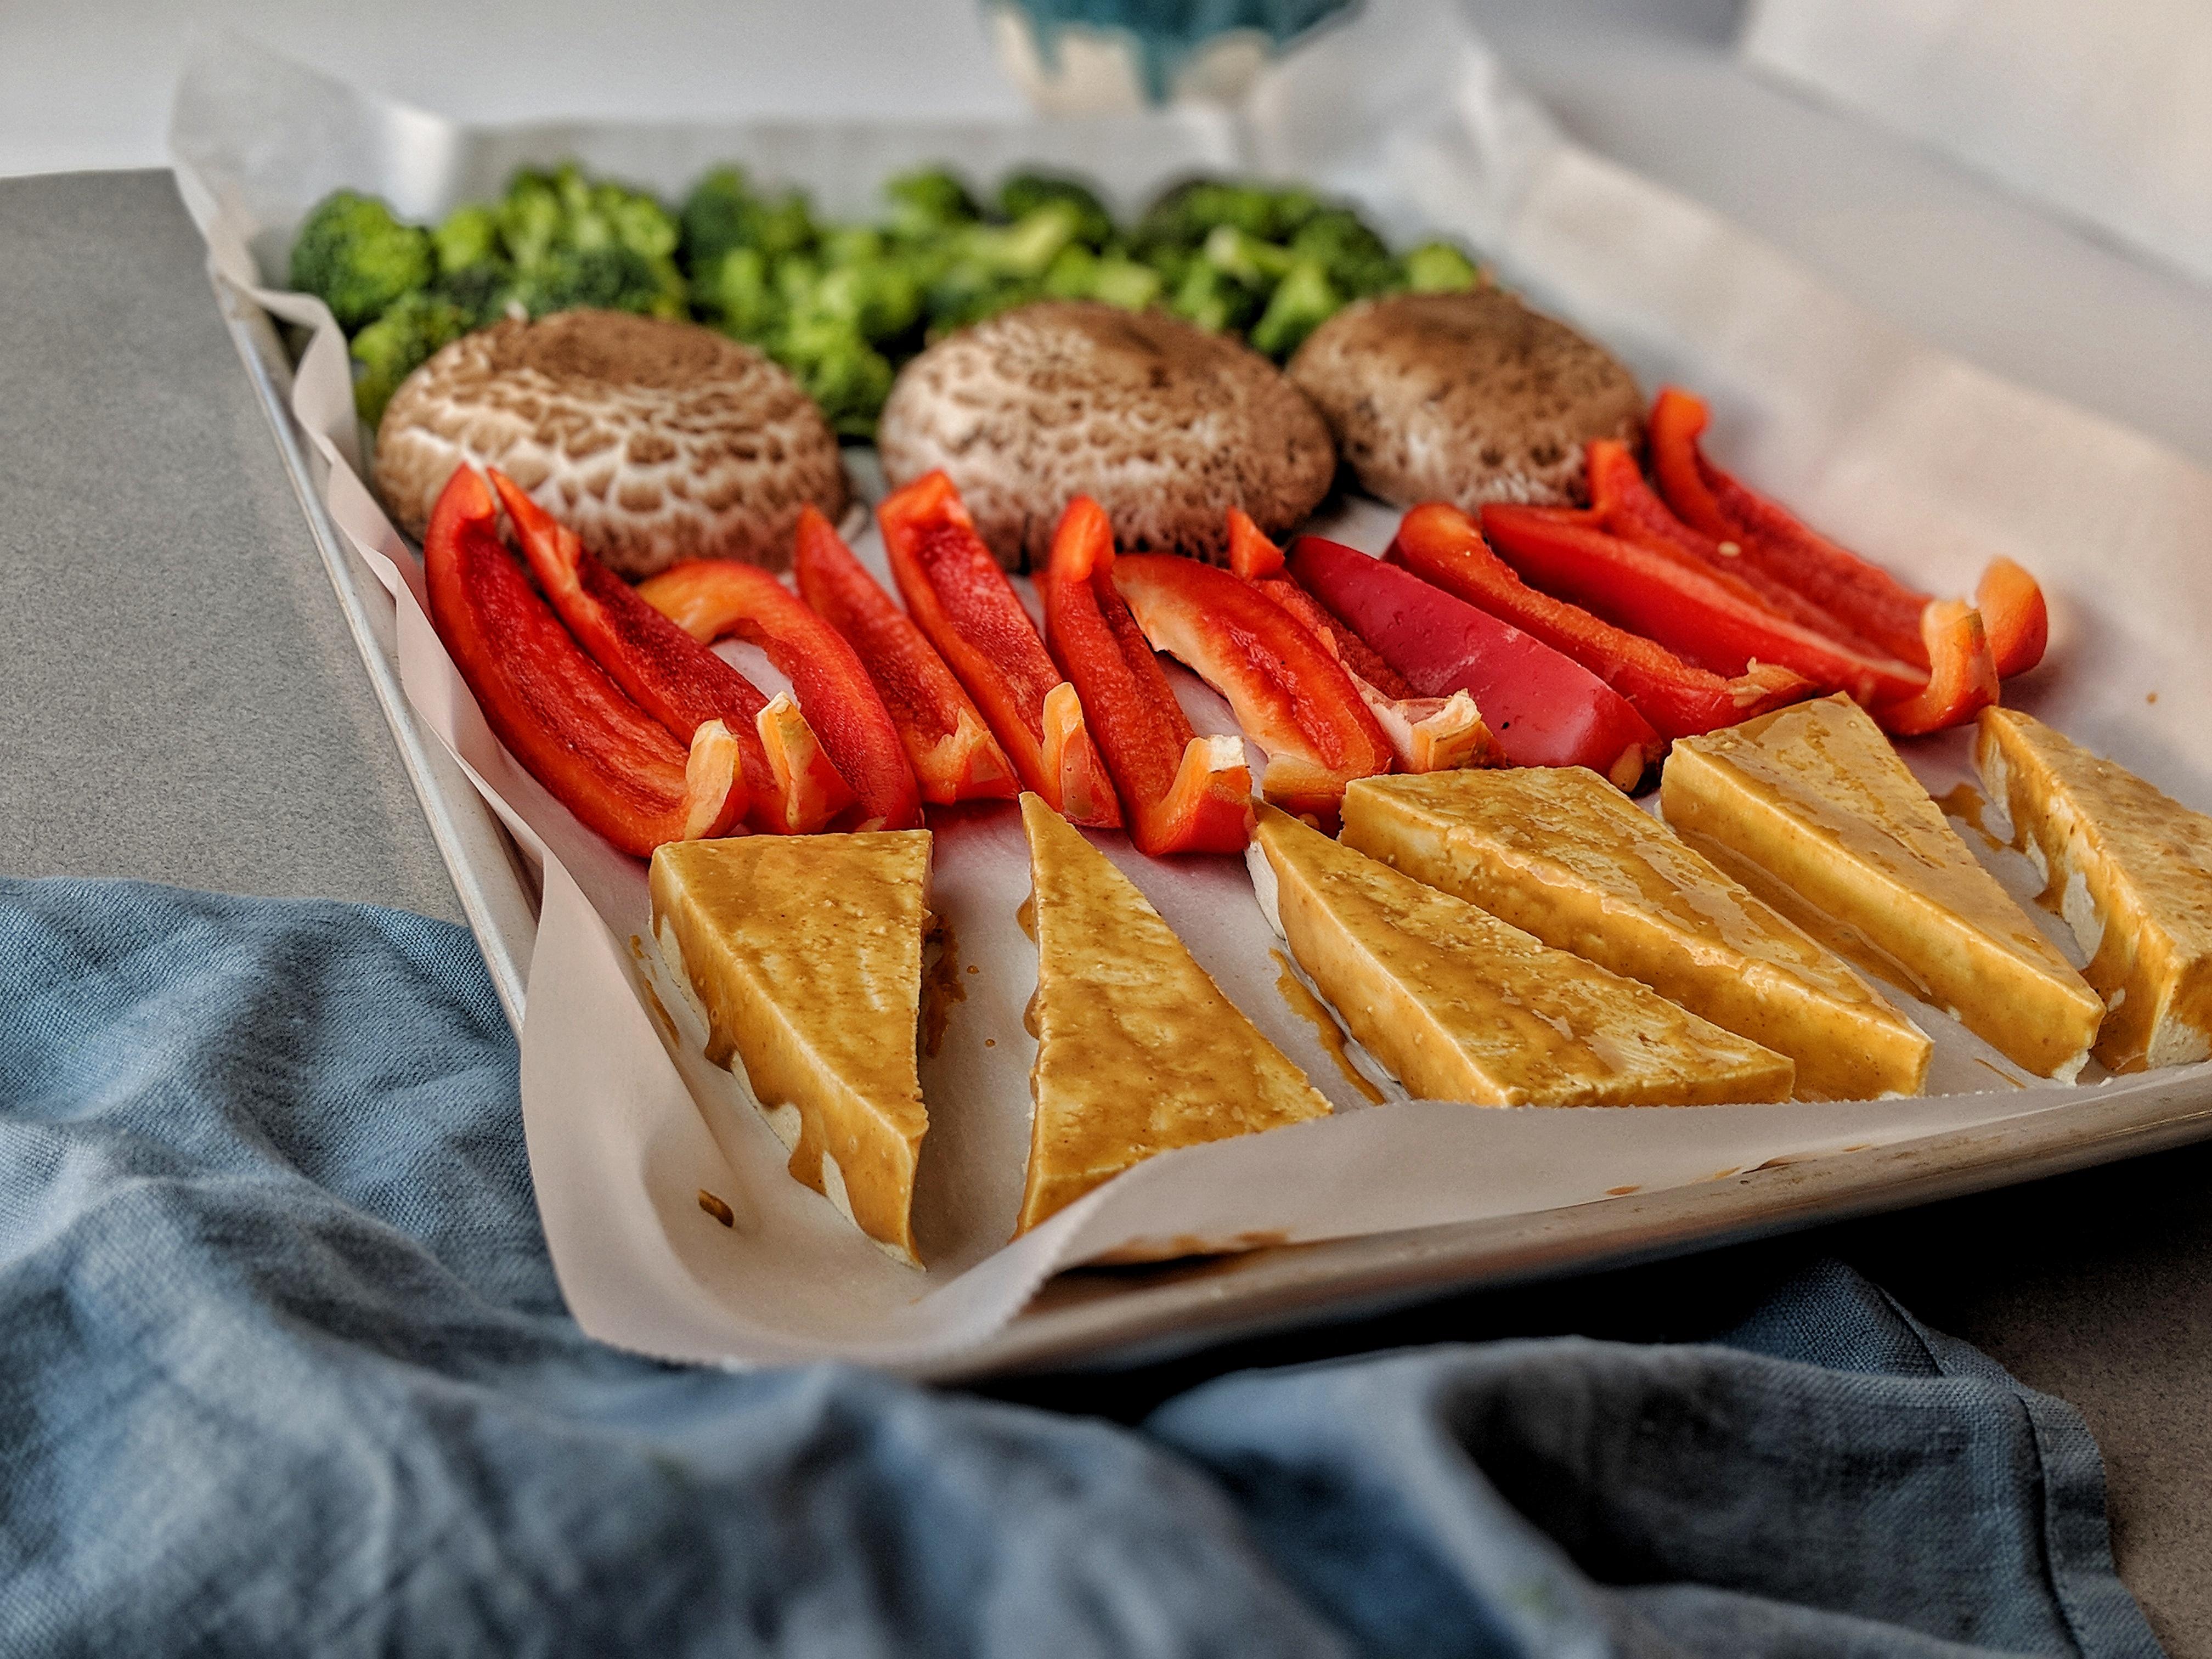 Spicy Peanut Tofu Sheet Pan Dinner | à la laren